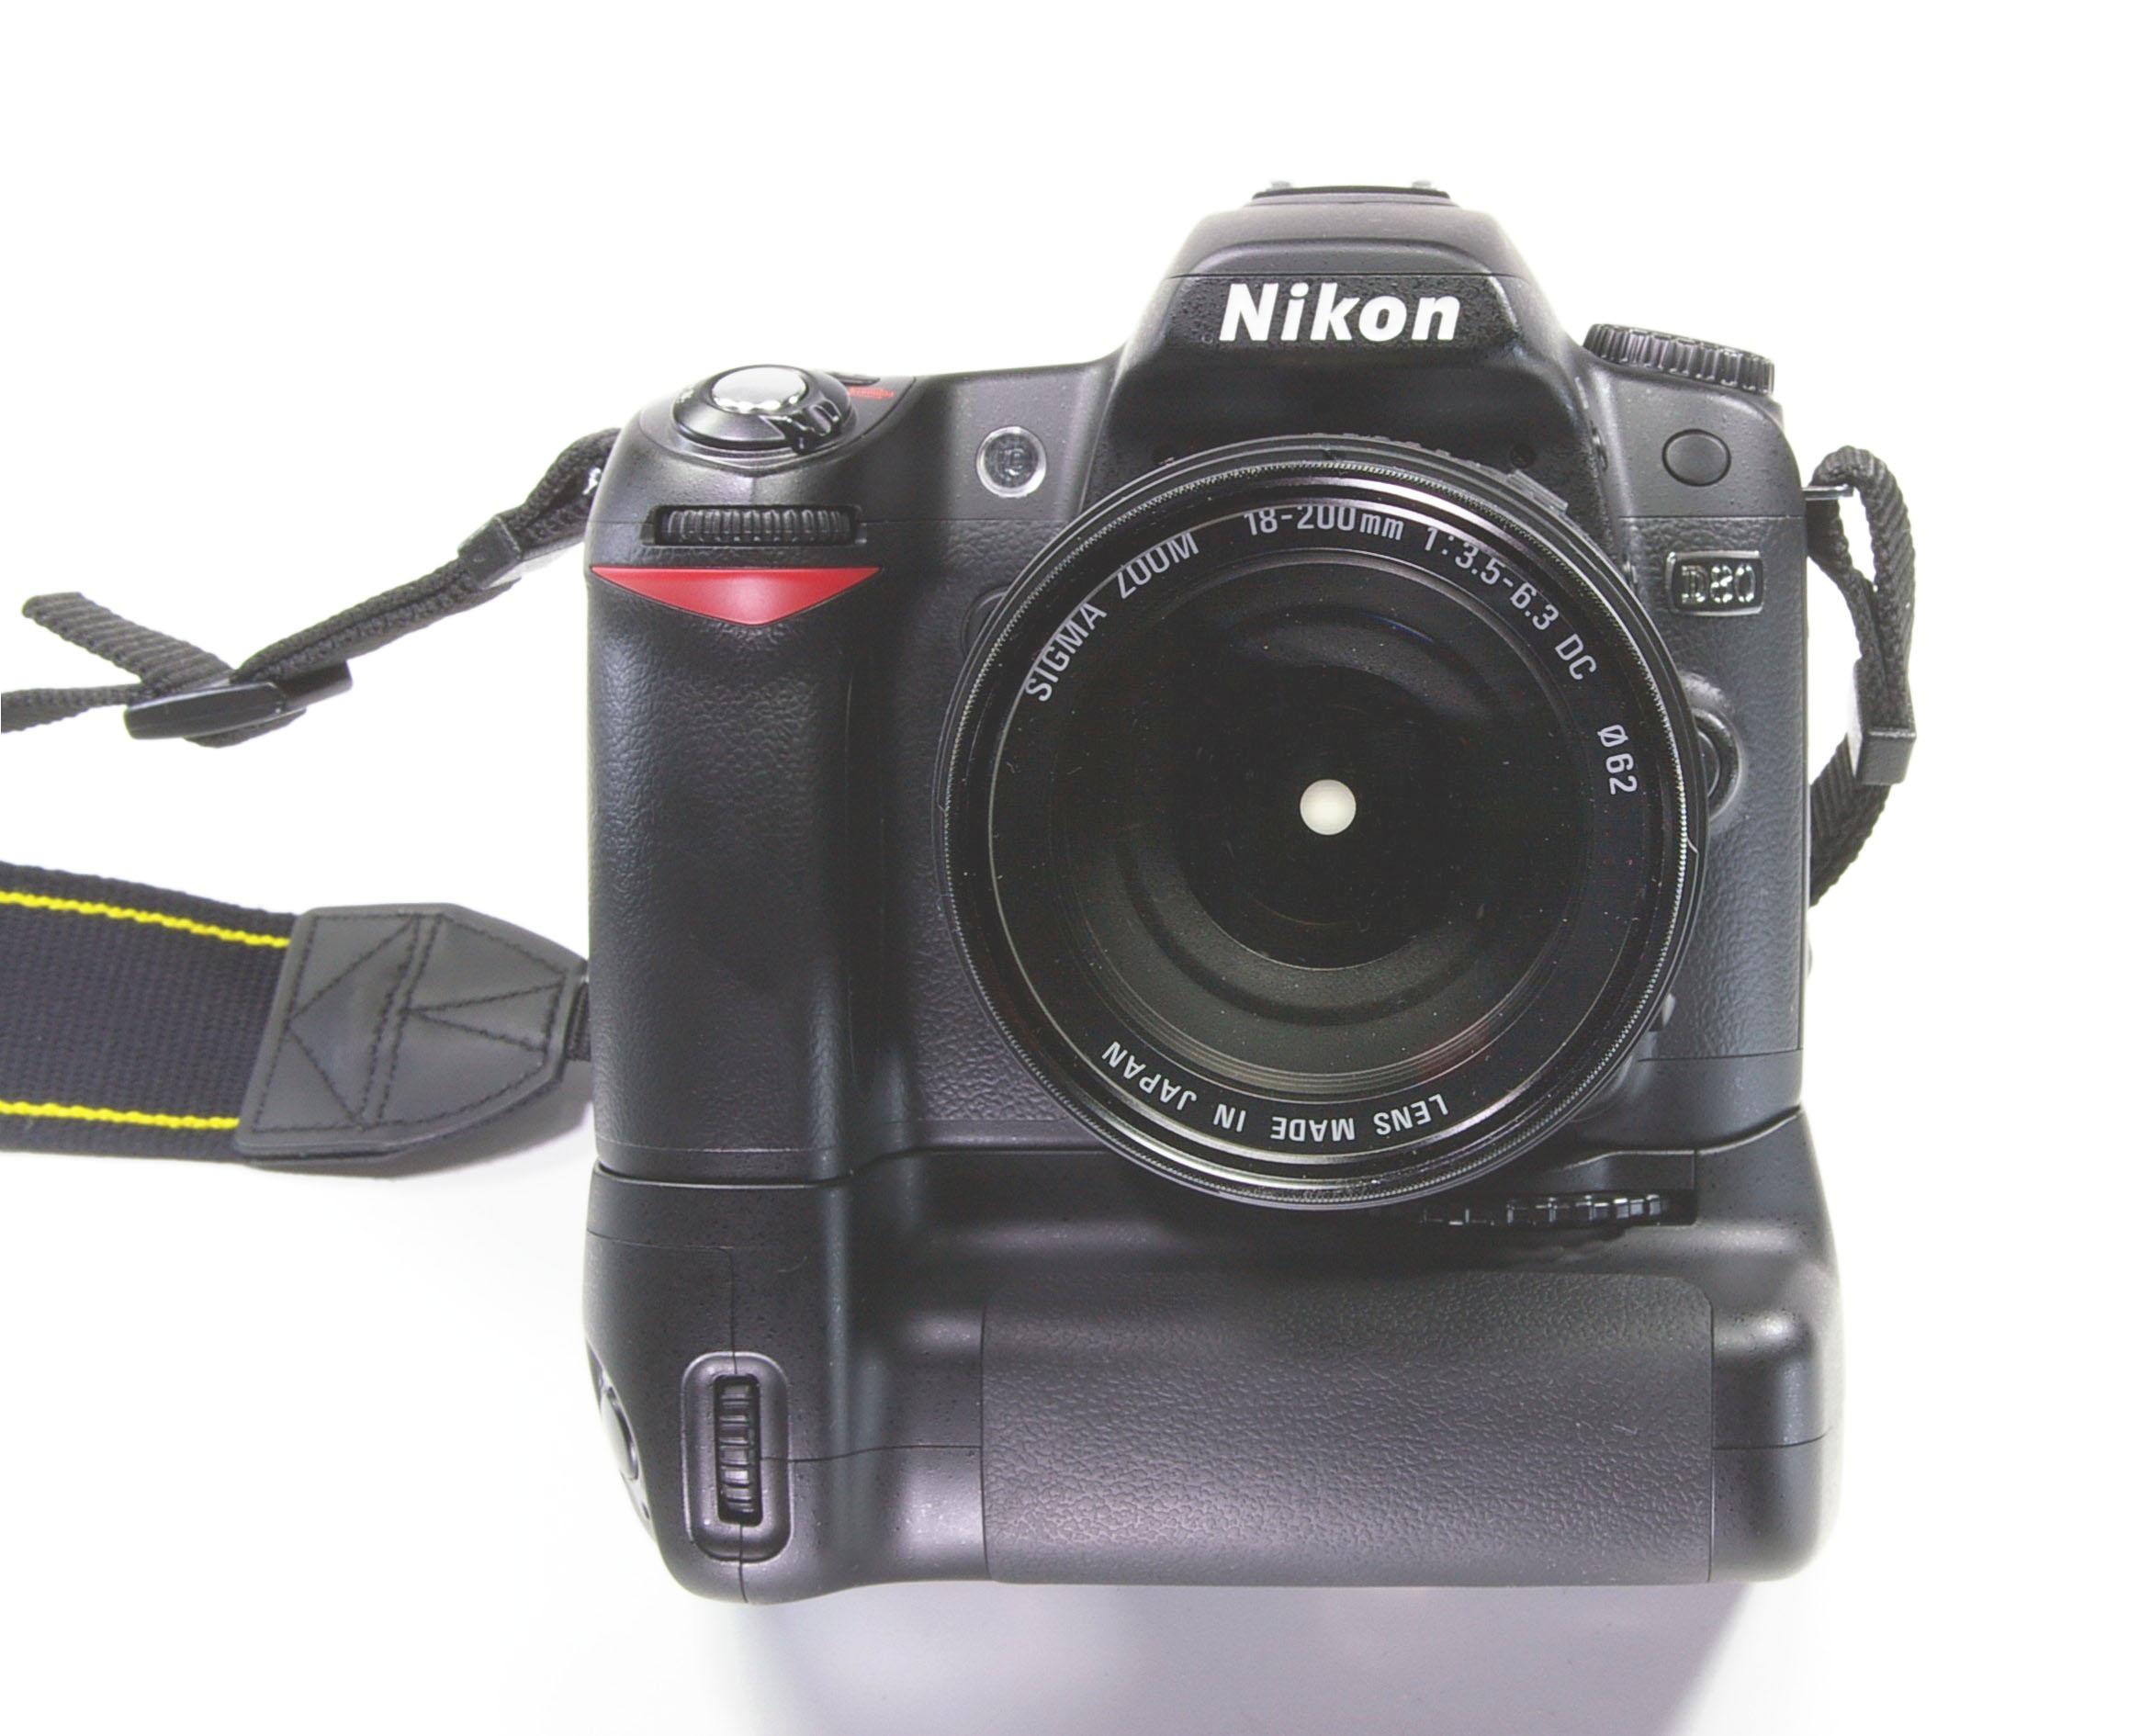 File:Nikon D80 Kamera.jpg